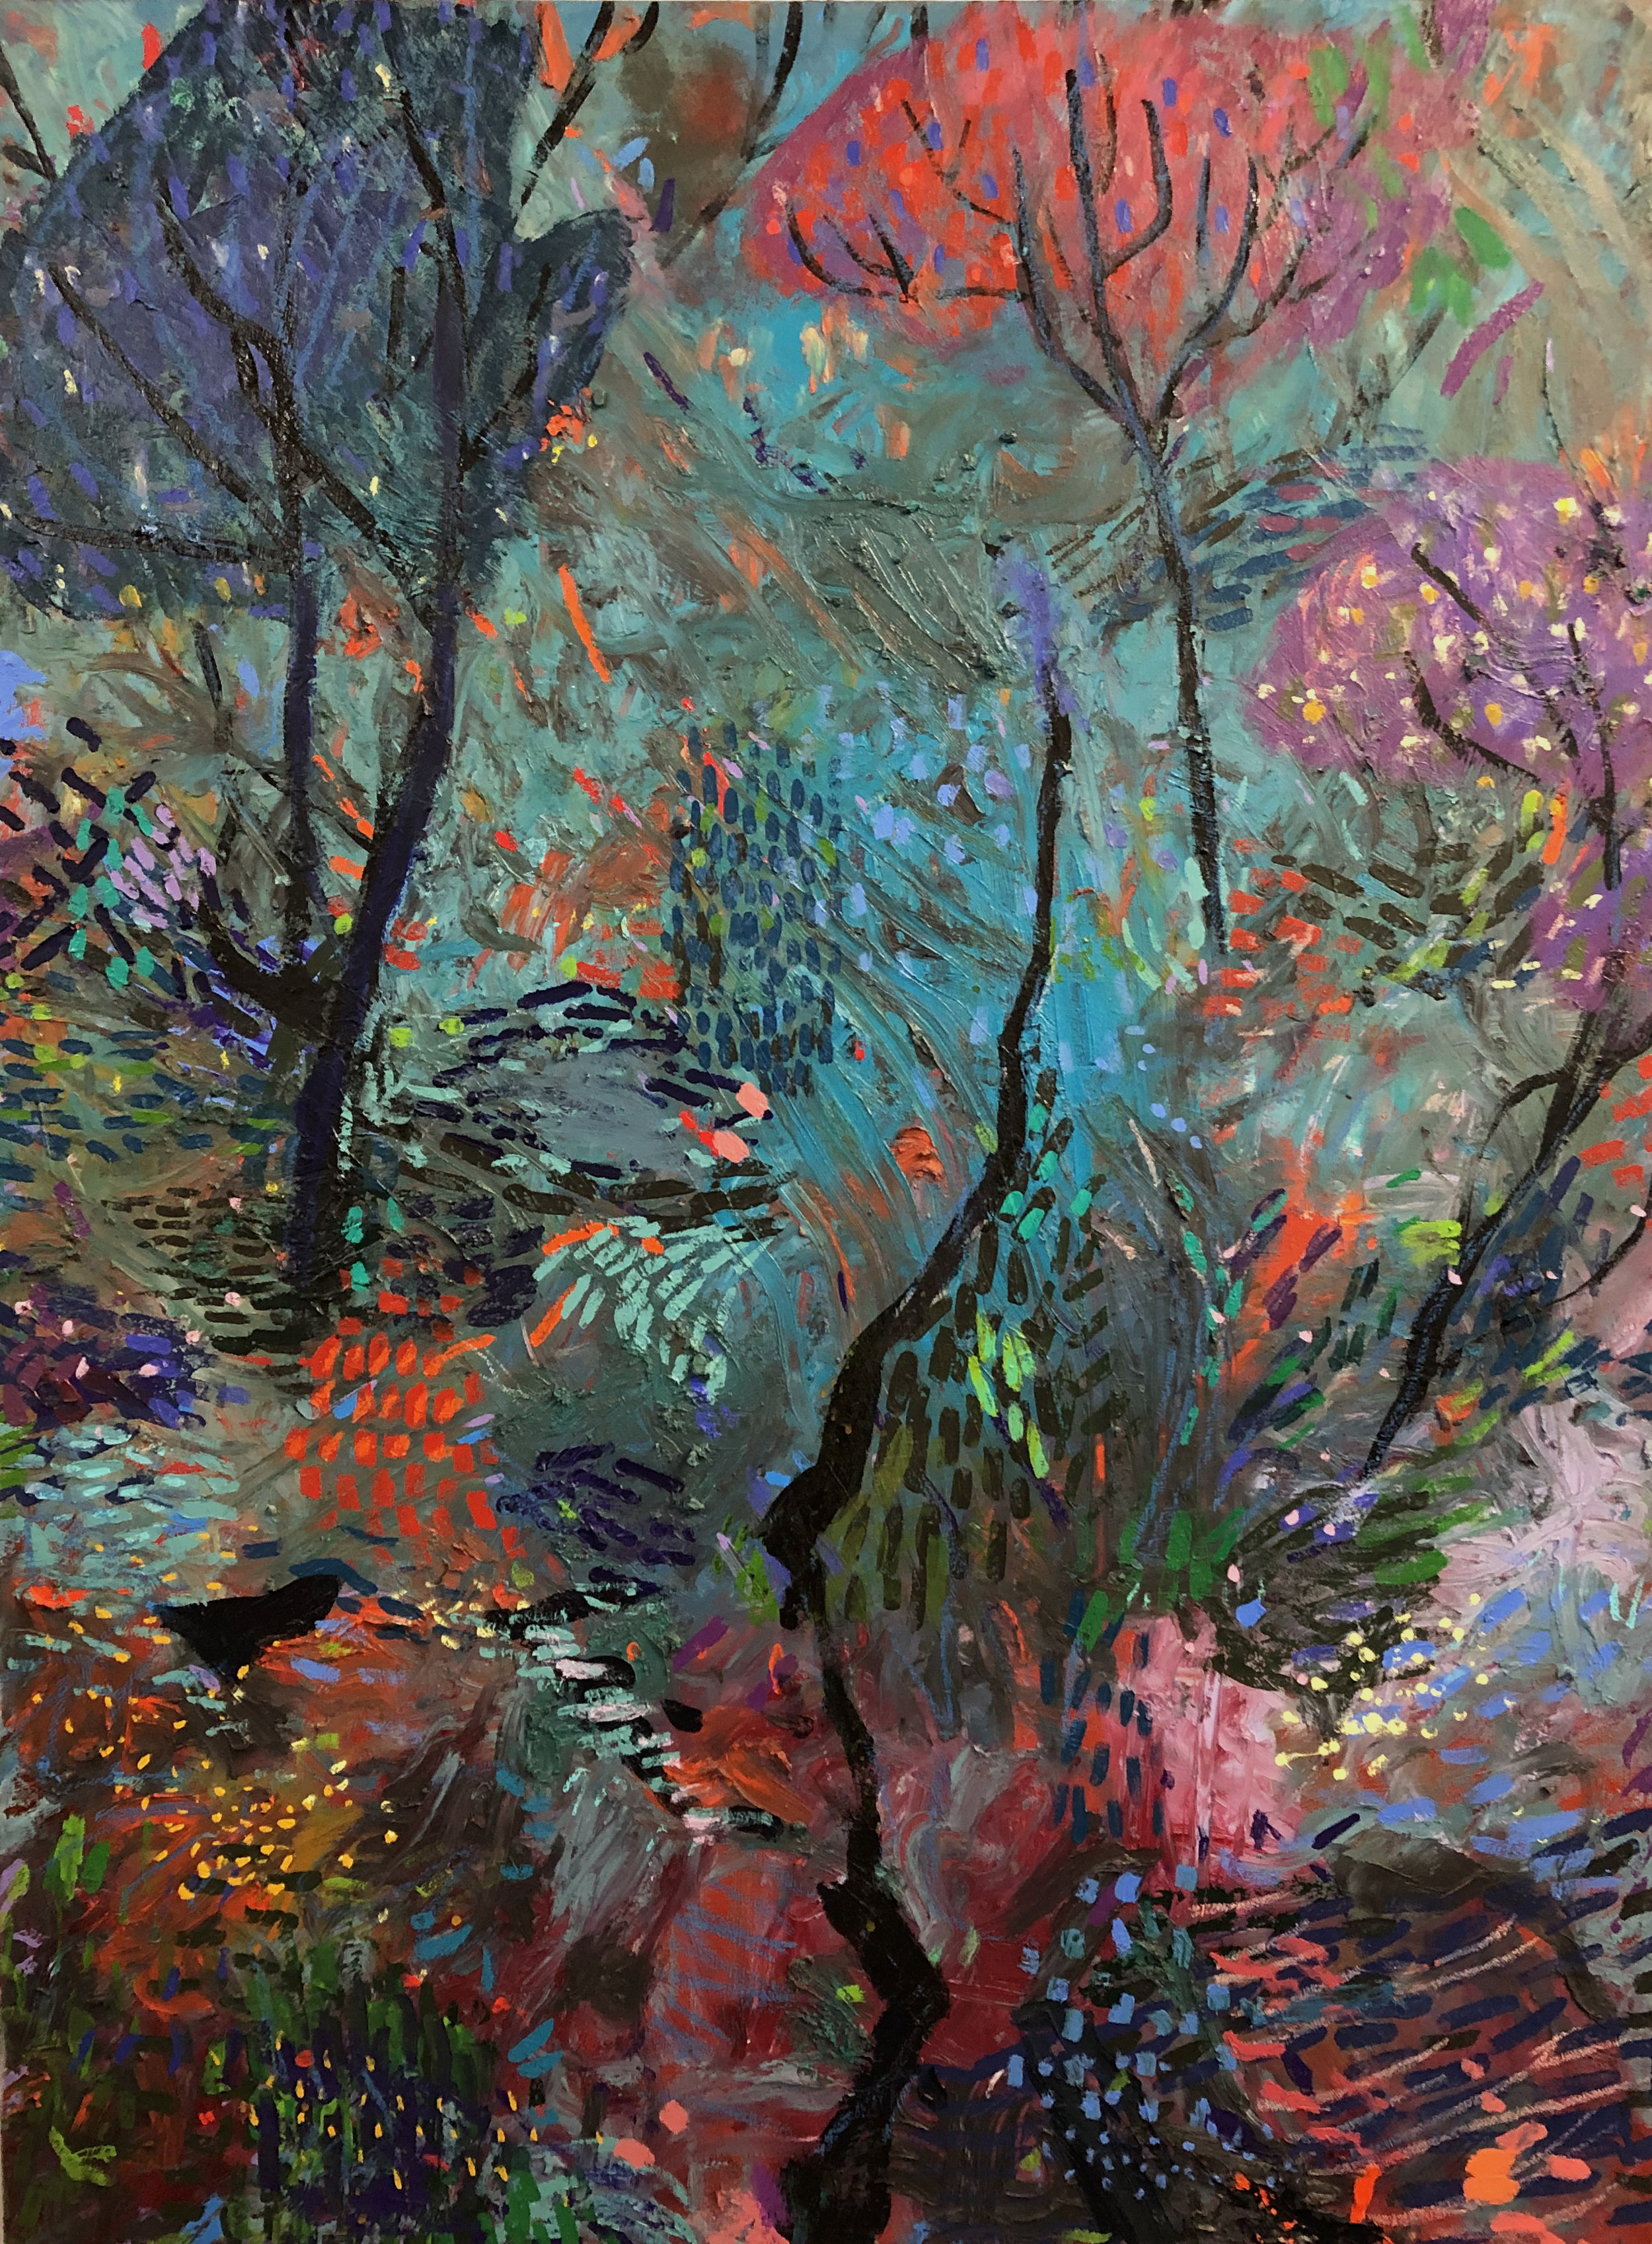 08_Joshua Petker, 48x36%22, acrylic and oil on canvas, 2018.jpg